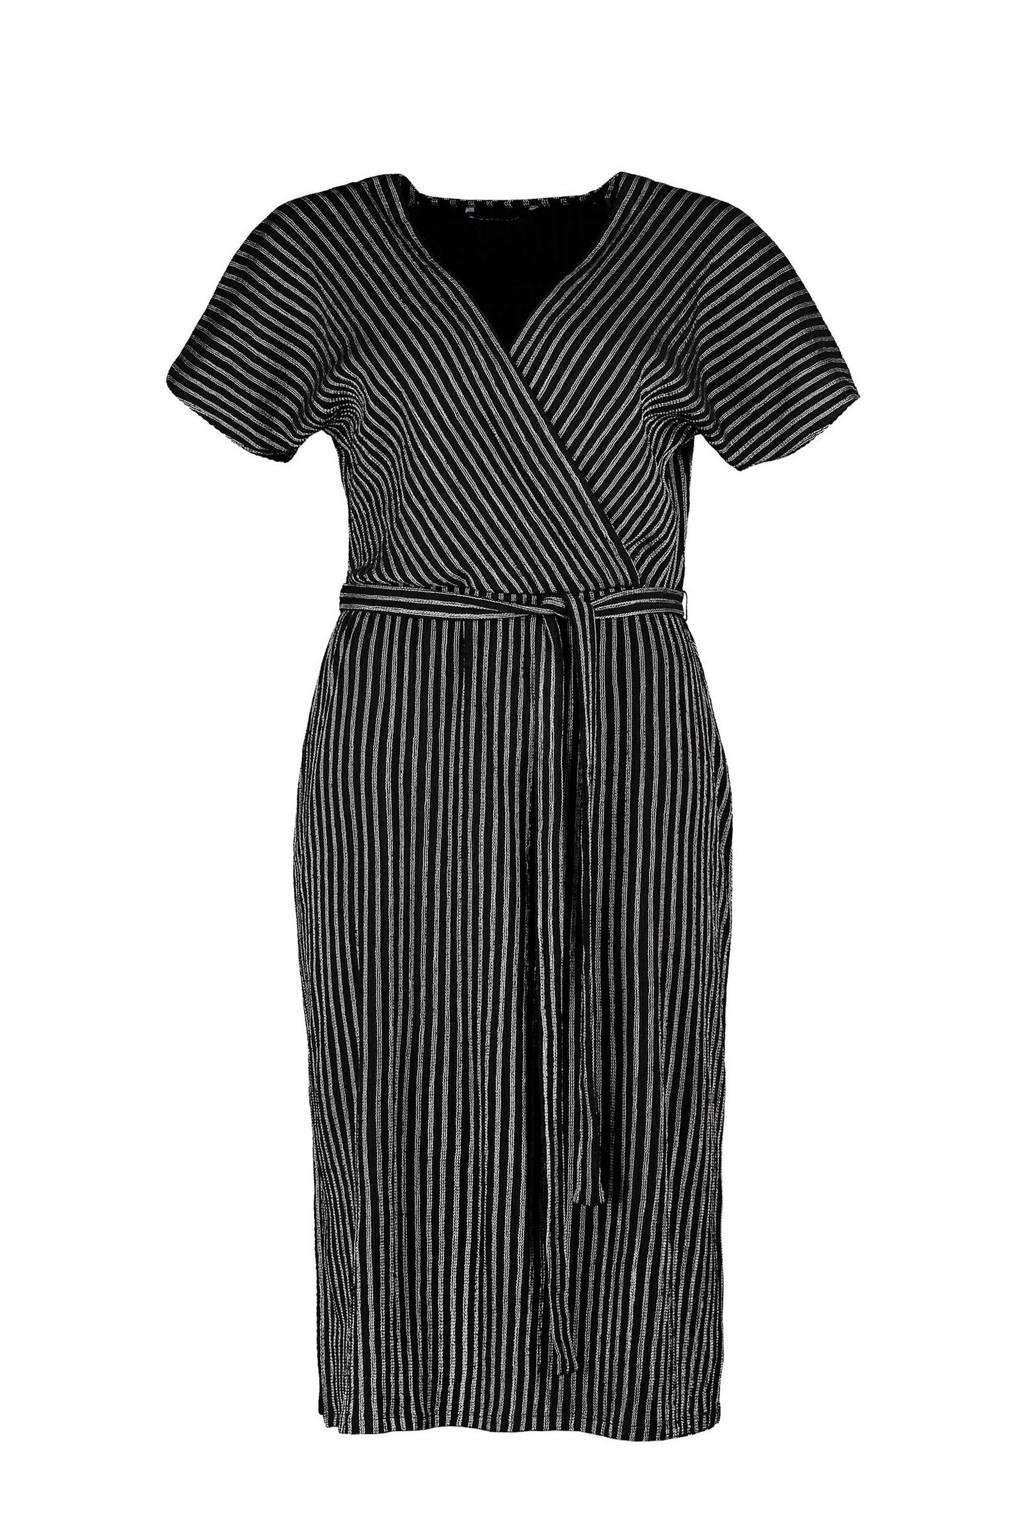 Expresso gestreepte jersey jurk zwart, Zwart